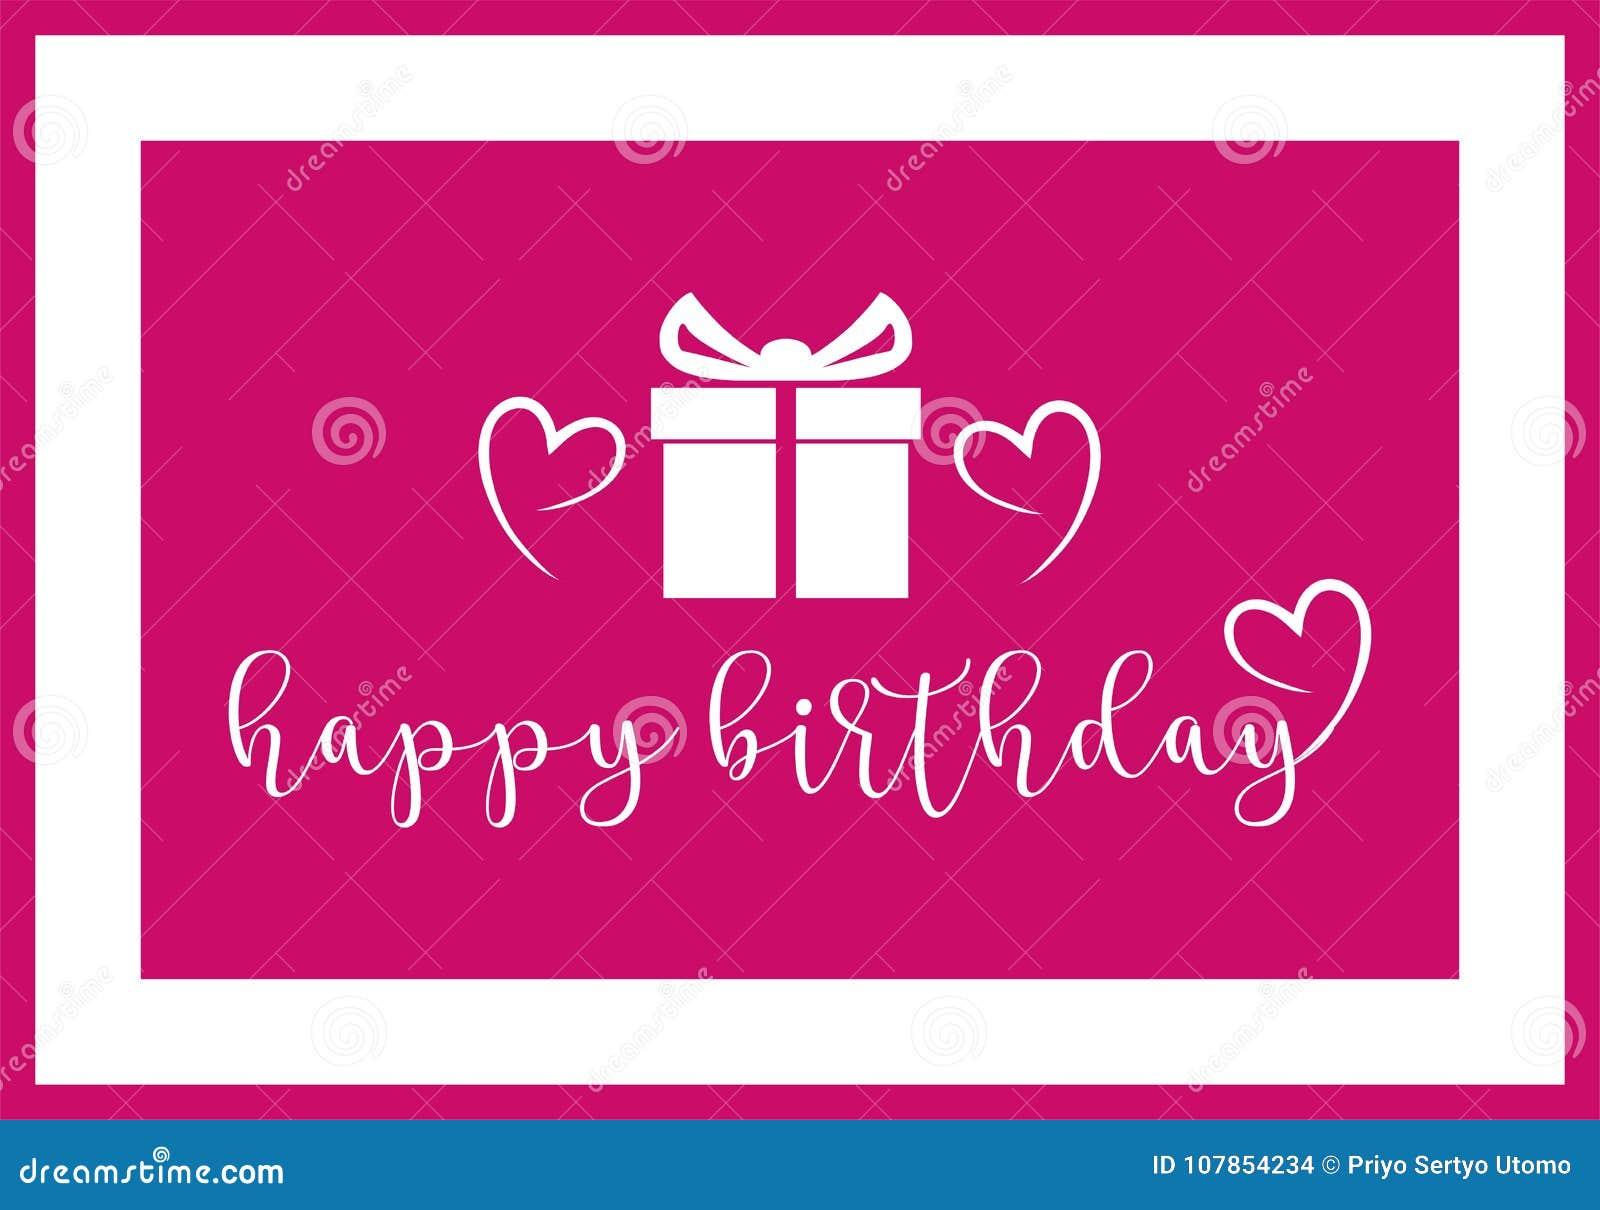 Happy birthday typographic design for greeting cards print and download happy birthday typographic design for greeting cards print and cloths stock vector illustration m4hsunfo